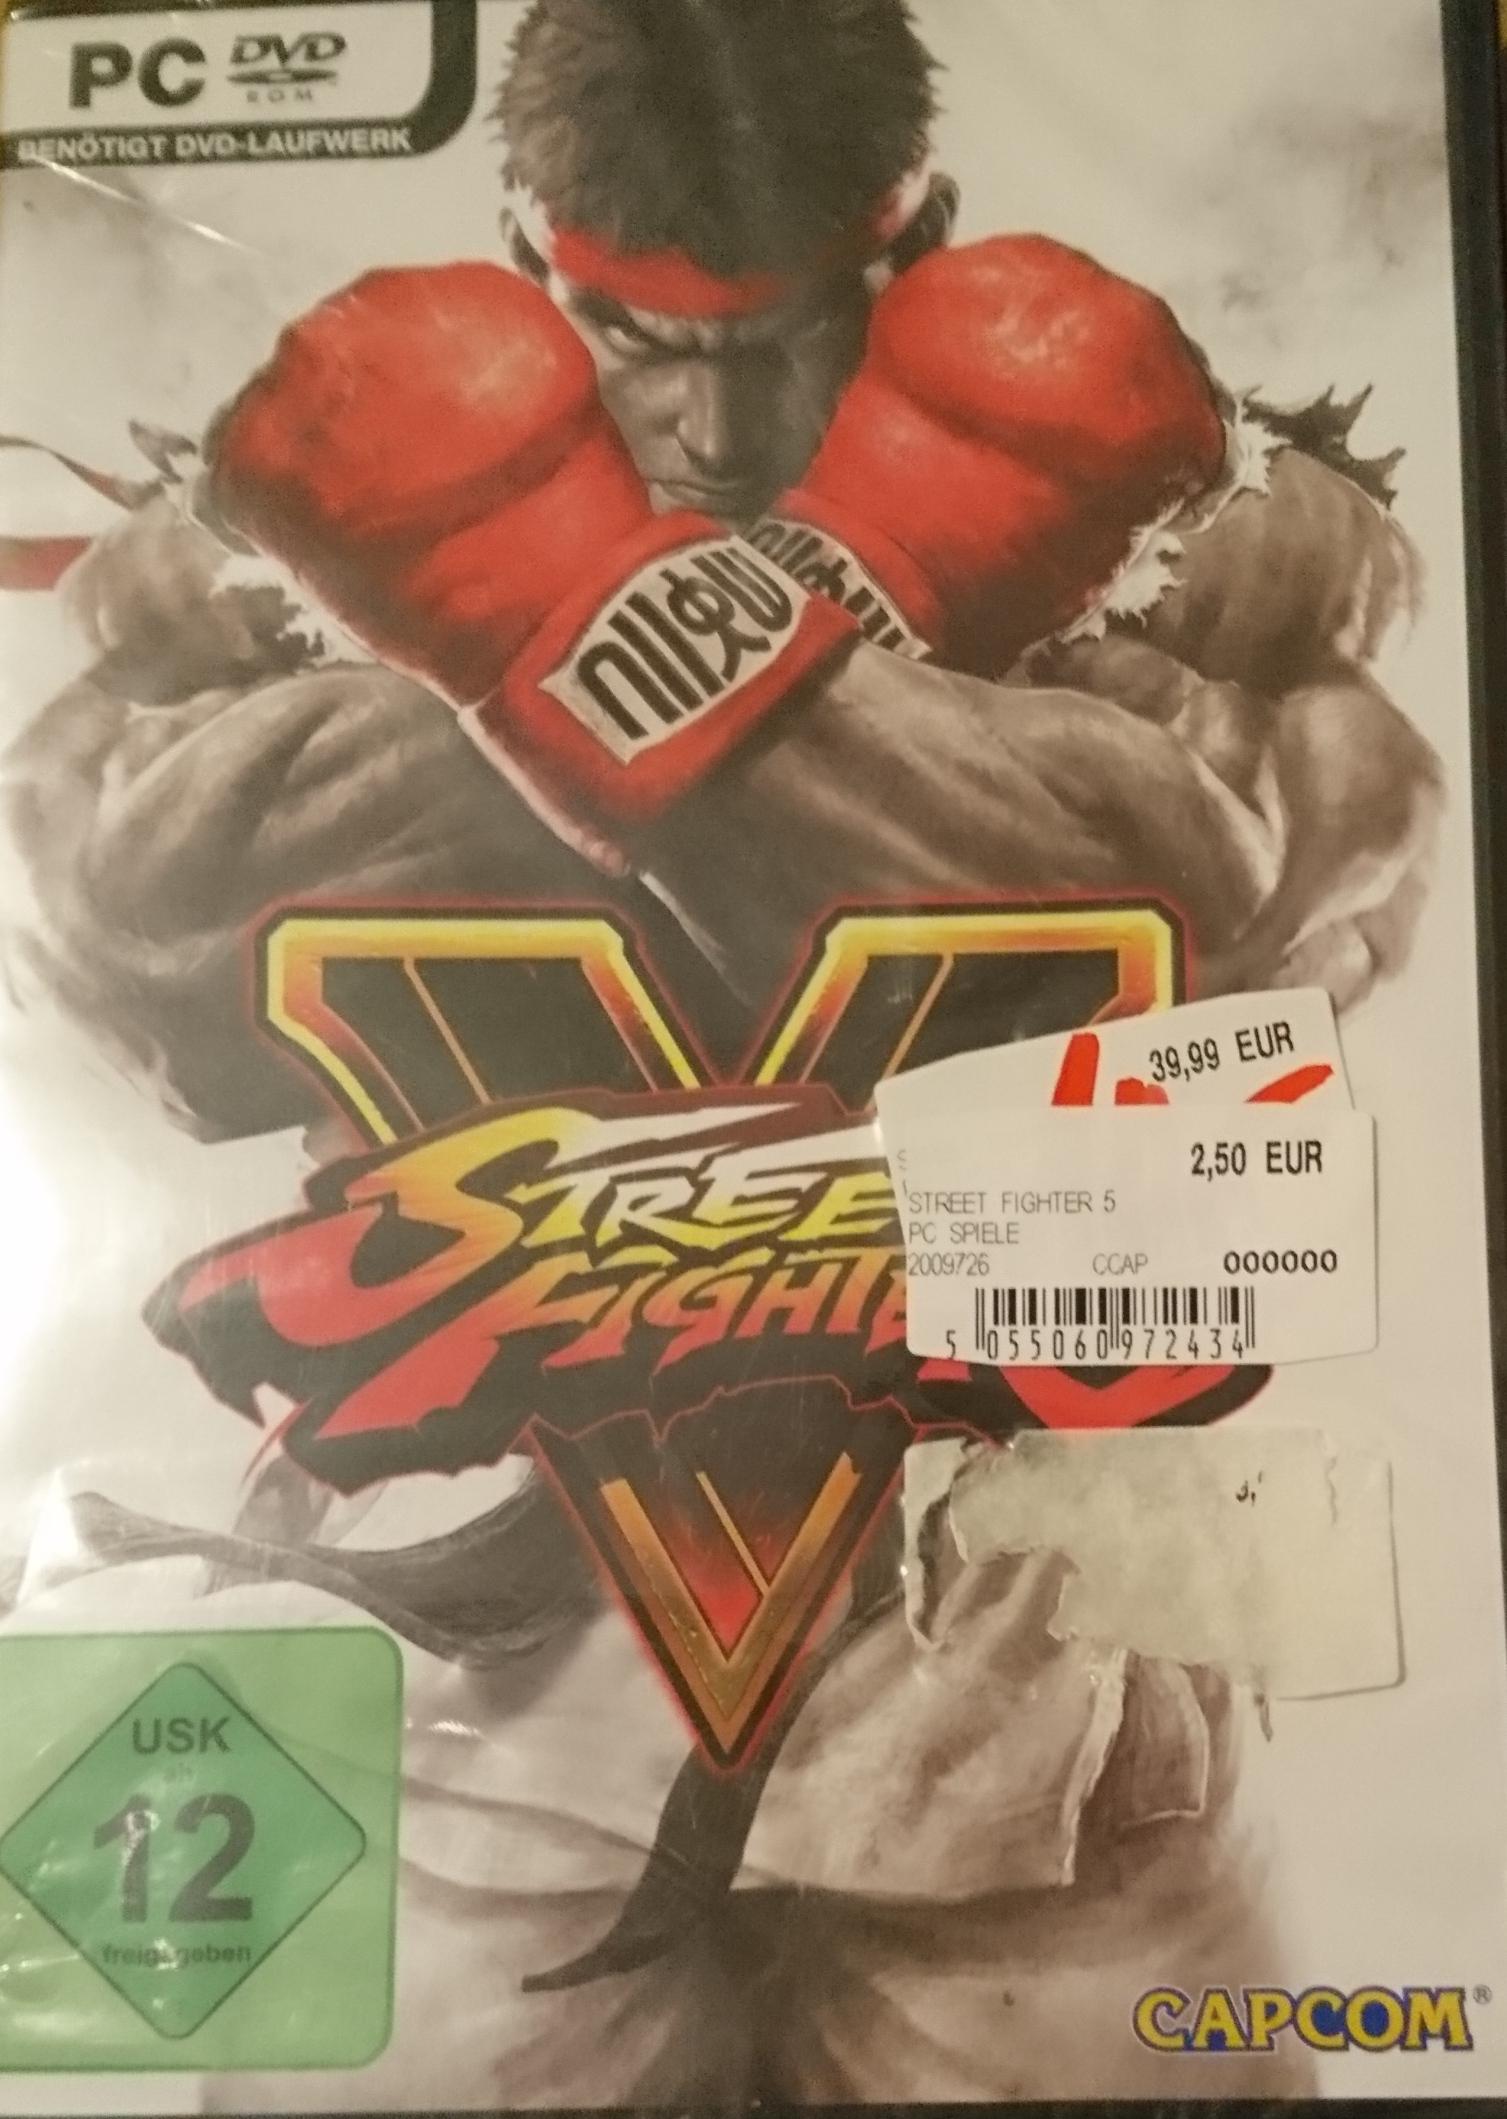 [LOKAL] Street Fighter V für PC (Boxversion) 2,50€ im Saturn Karlsruhe-Durlach